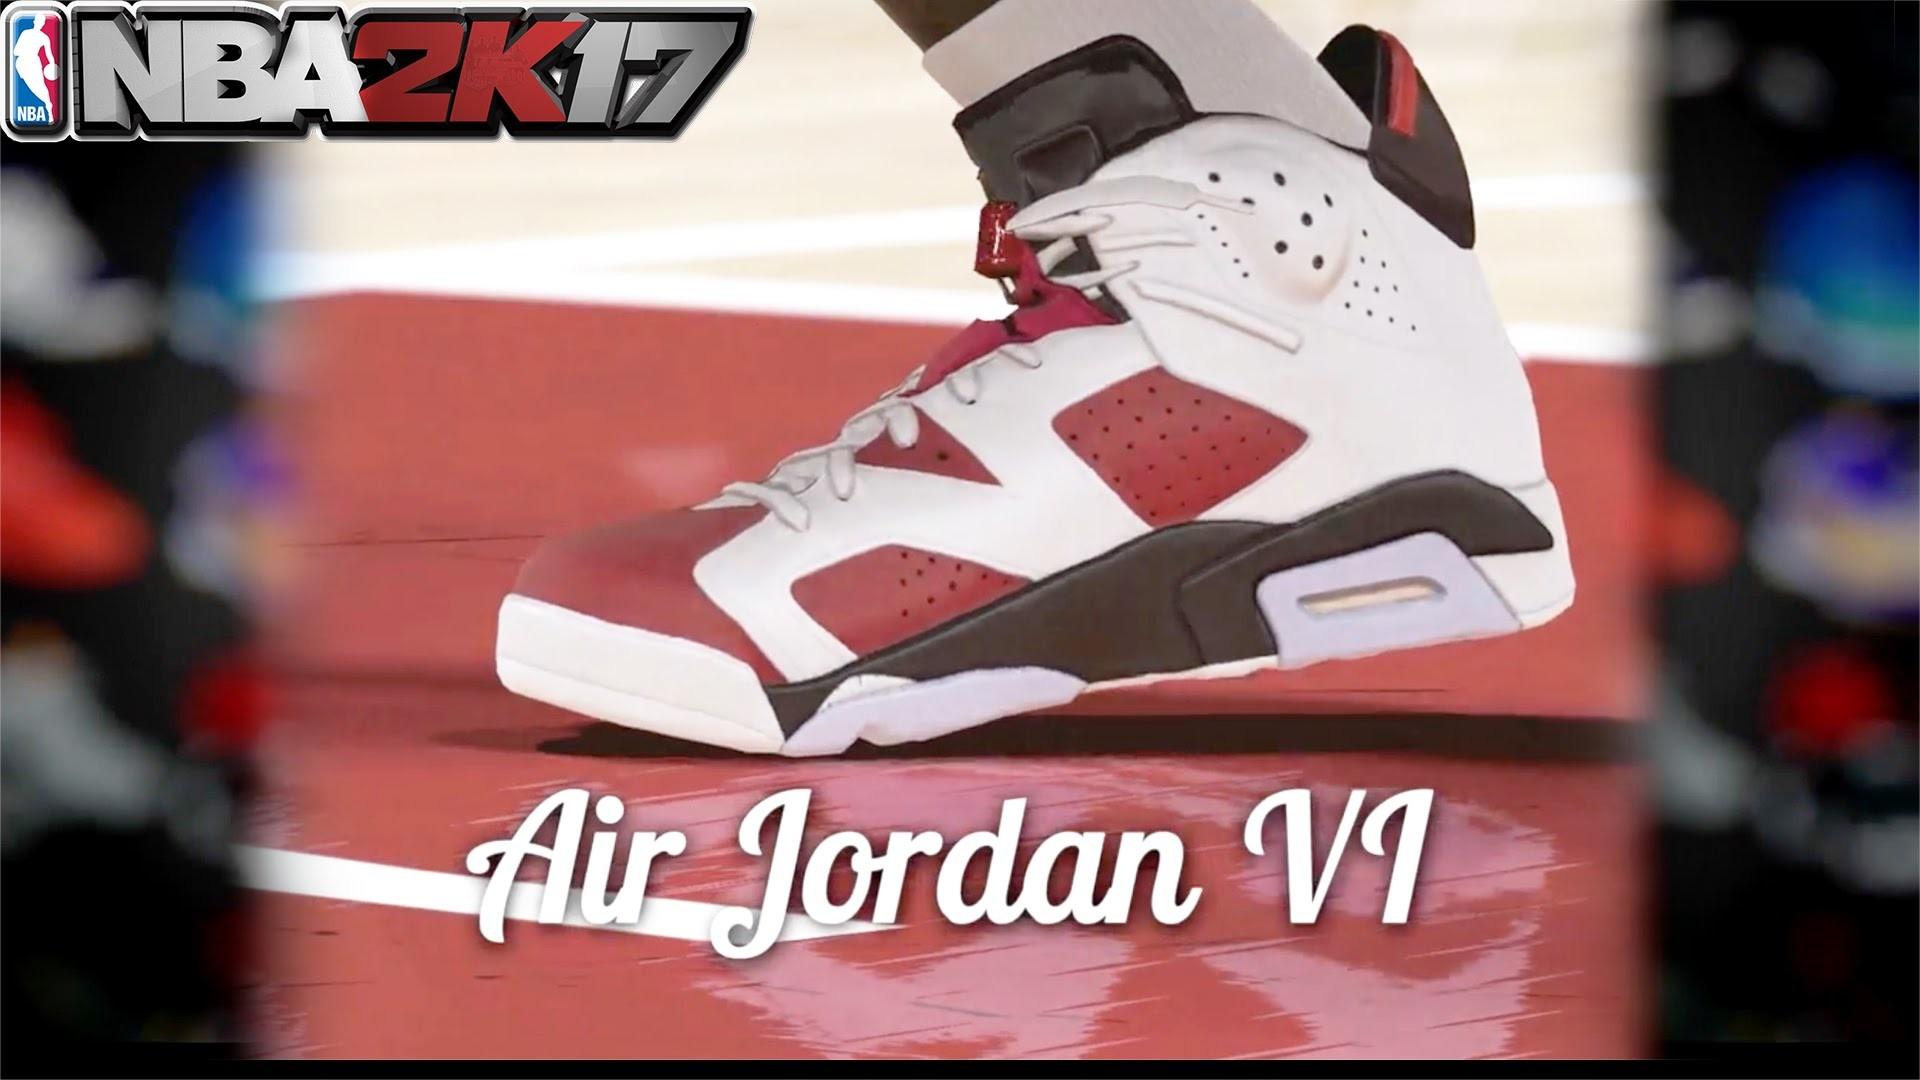 1080x1920 Wallpaper iphone jordan - Jordan Fly Wade Nike Shoe Art Iphone 7 Wallpaper